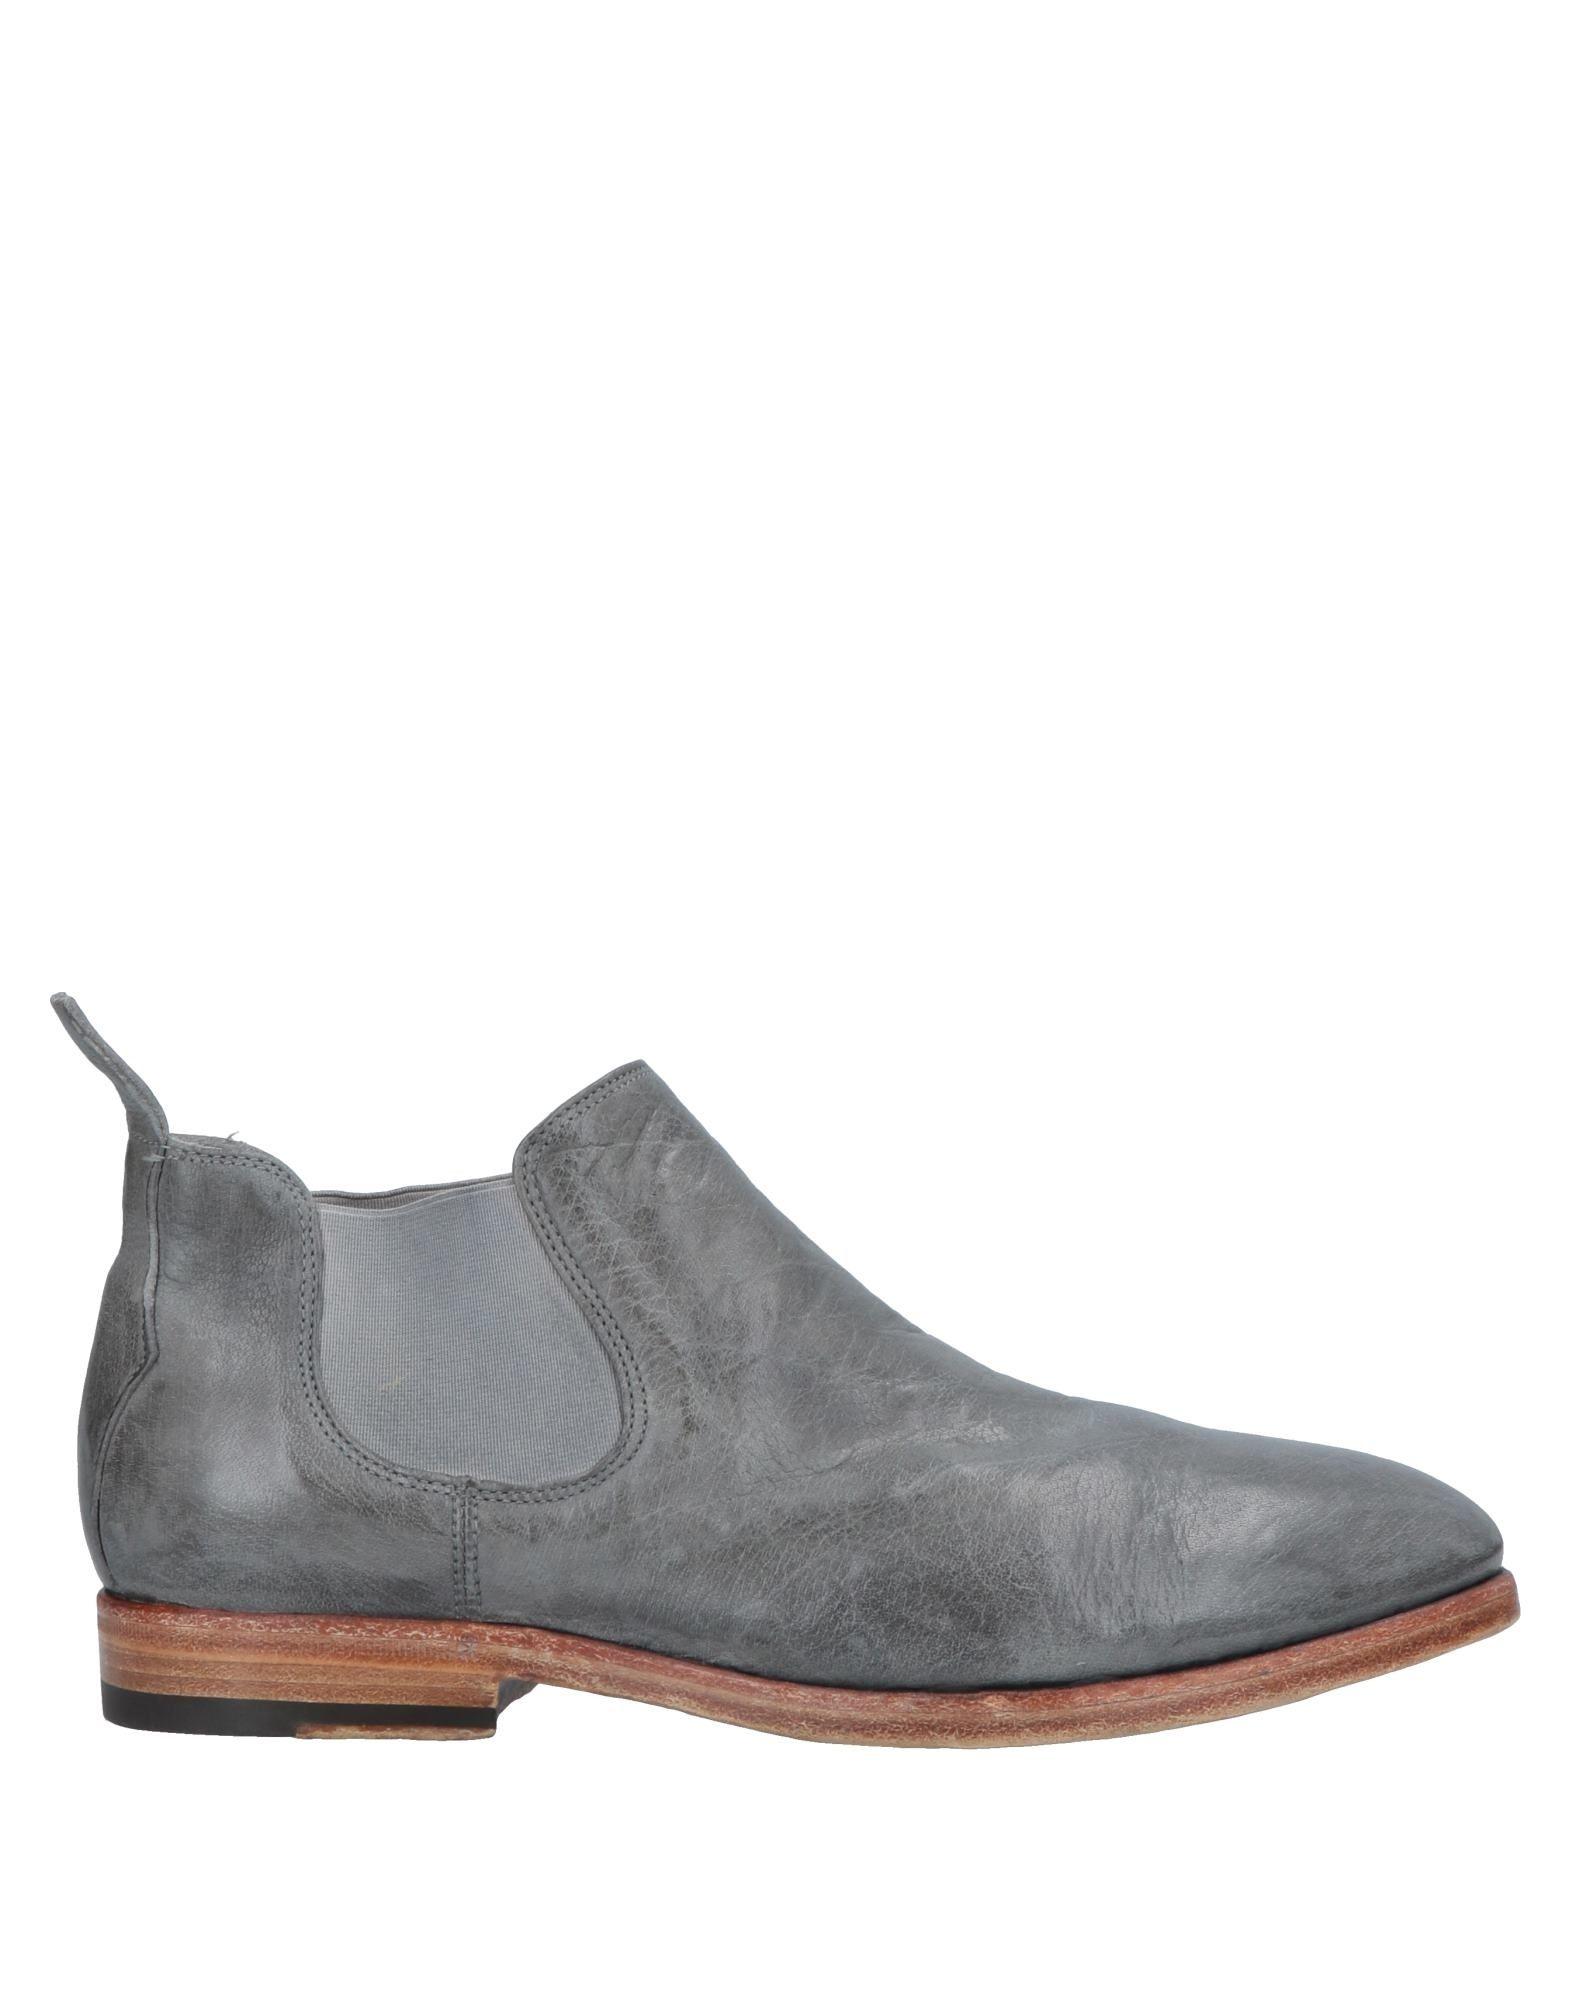 MEASPONTE® Полусапоги и высокие ботинки ботинки swims ботинки без каблука